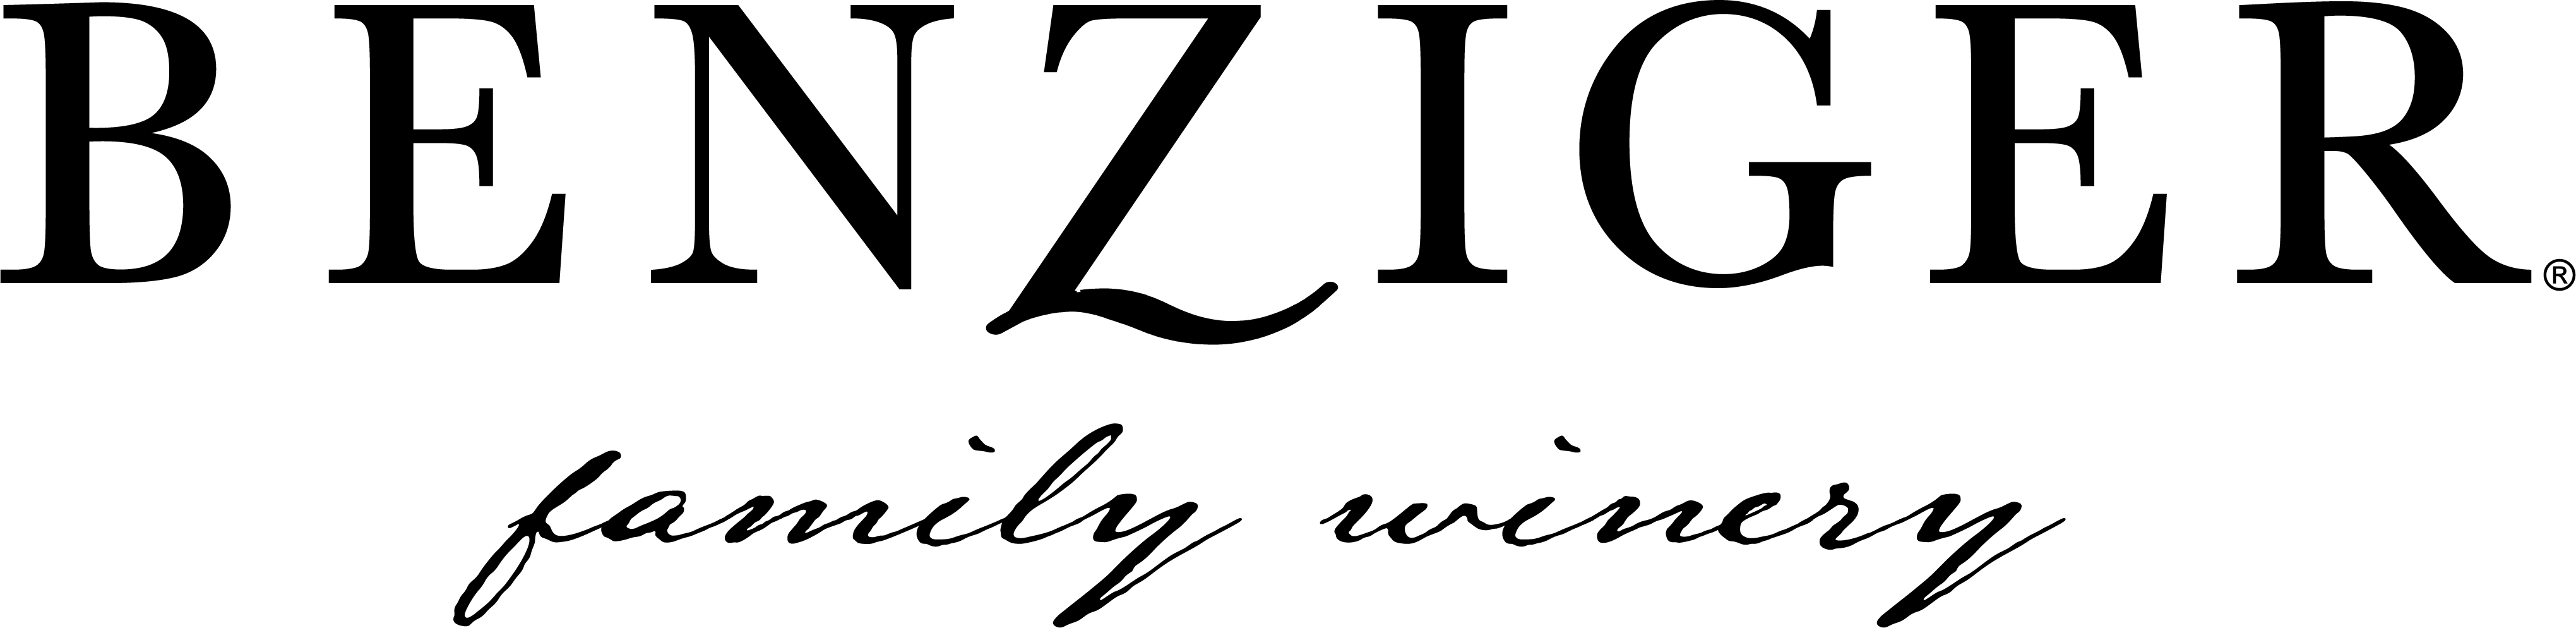 Benziger_logo